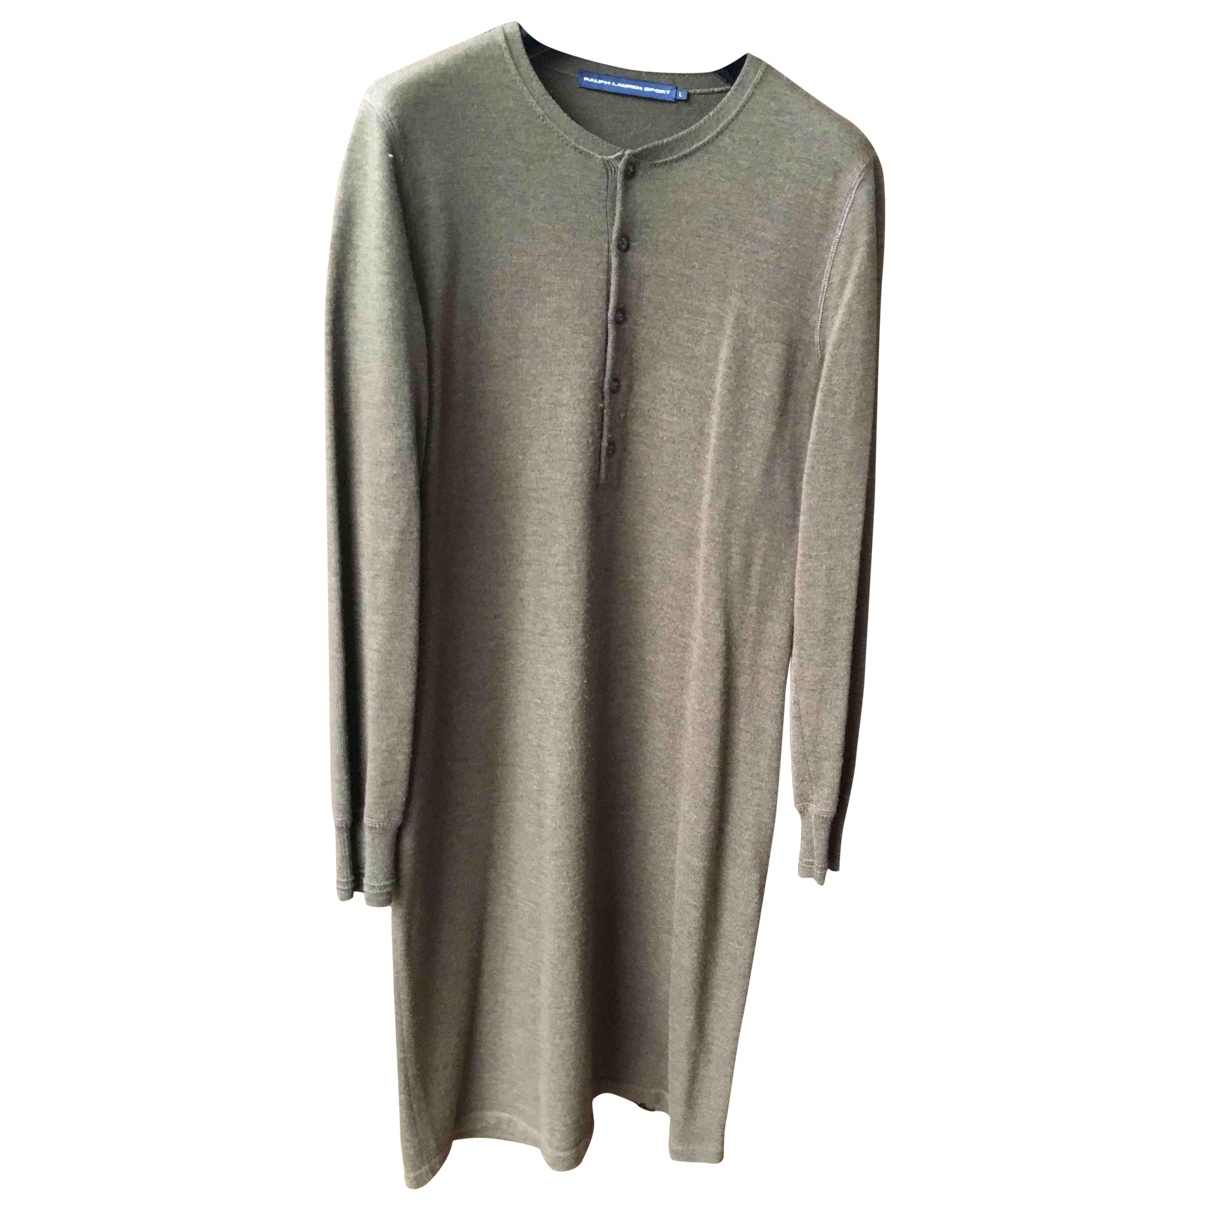 Ralph Lauren \N Khaki Wool dress for Women L International